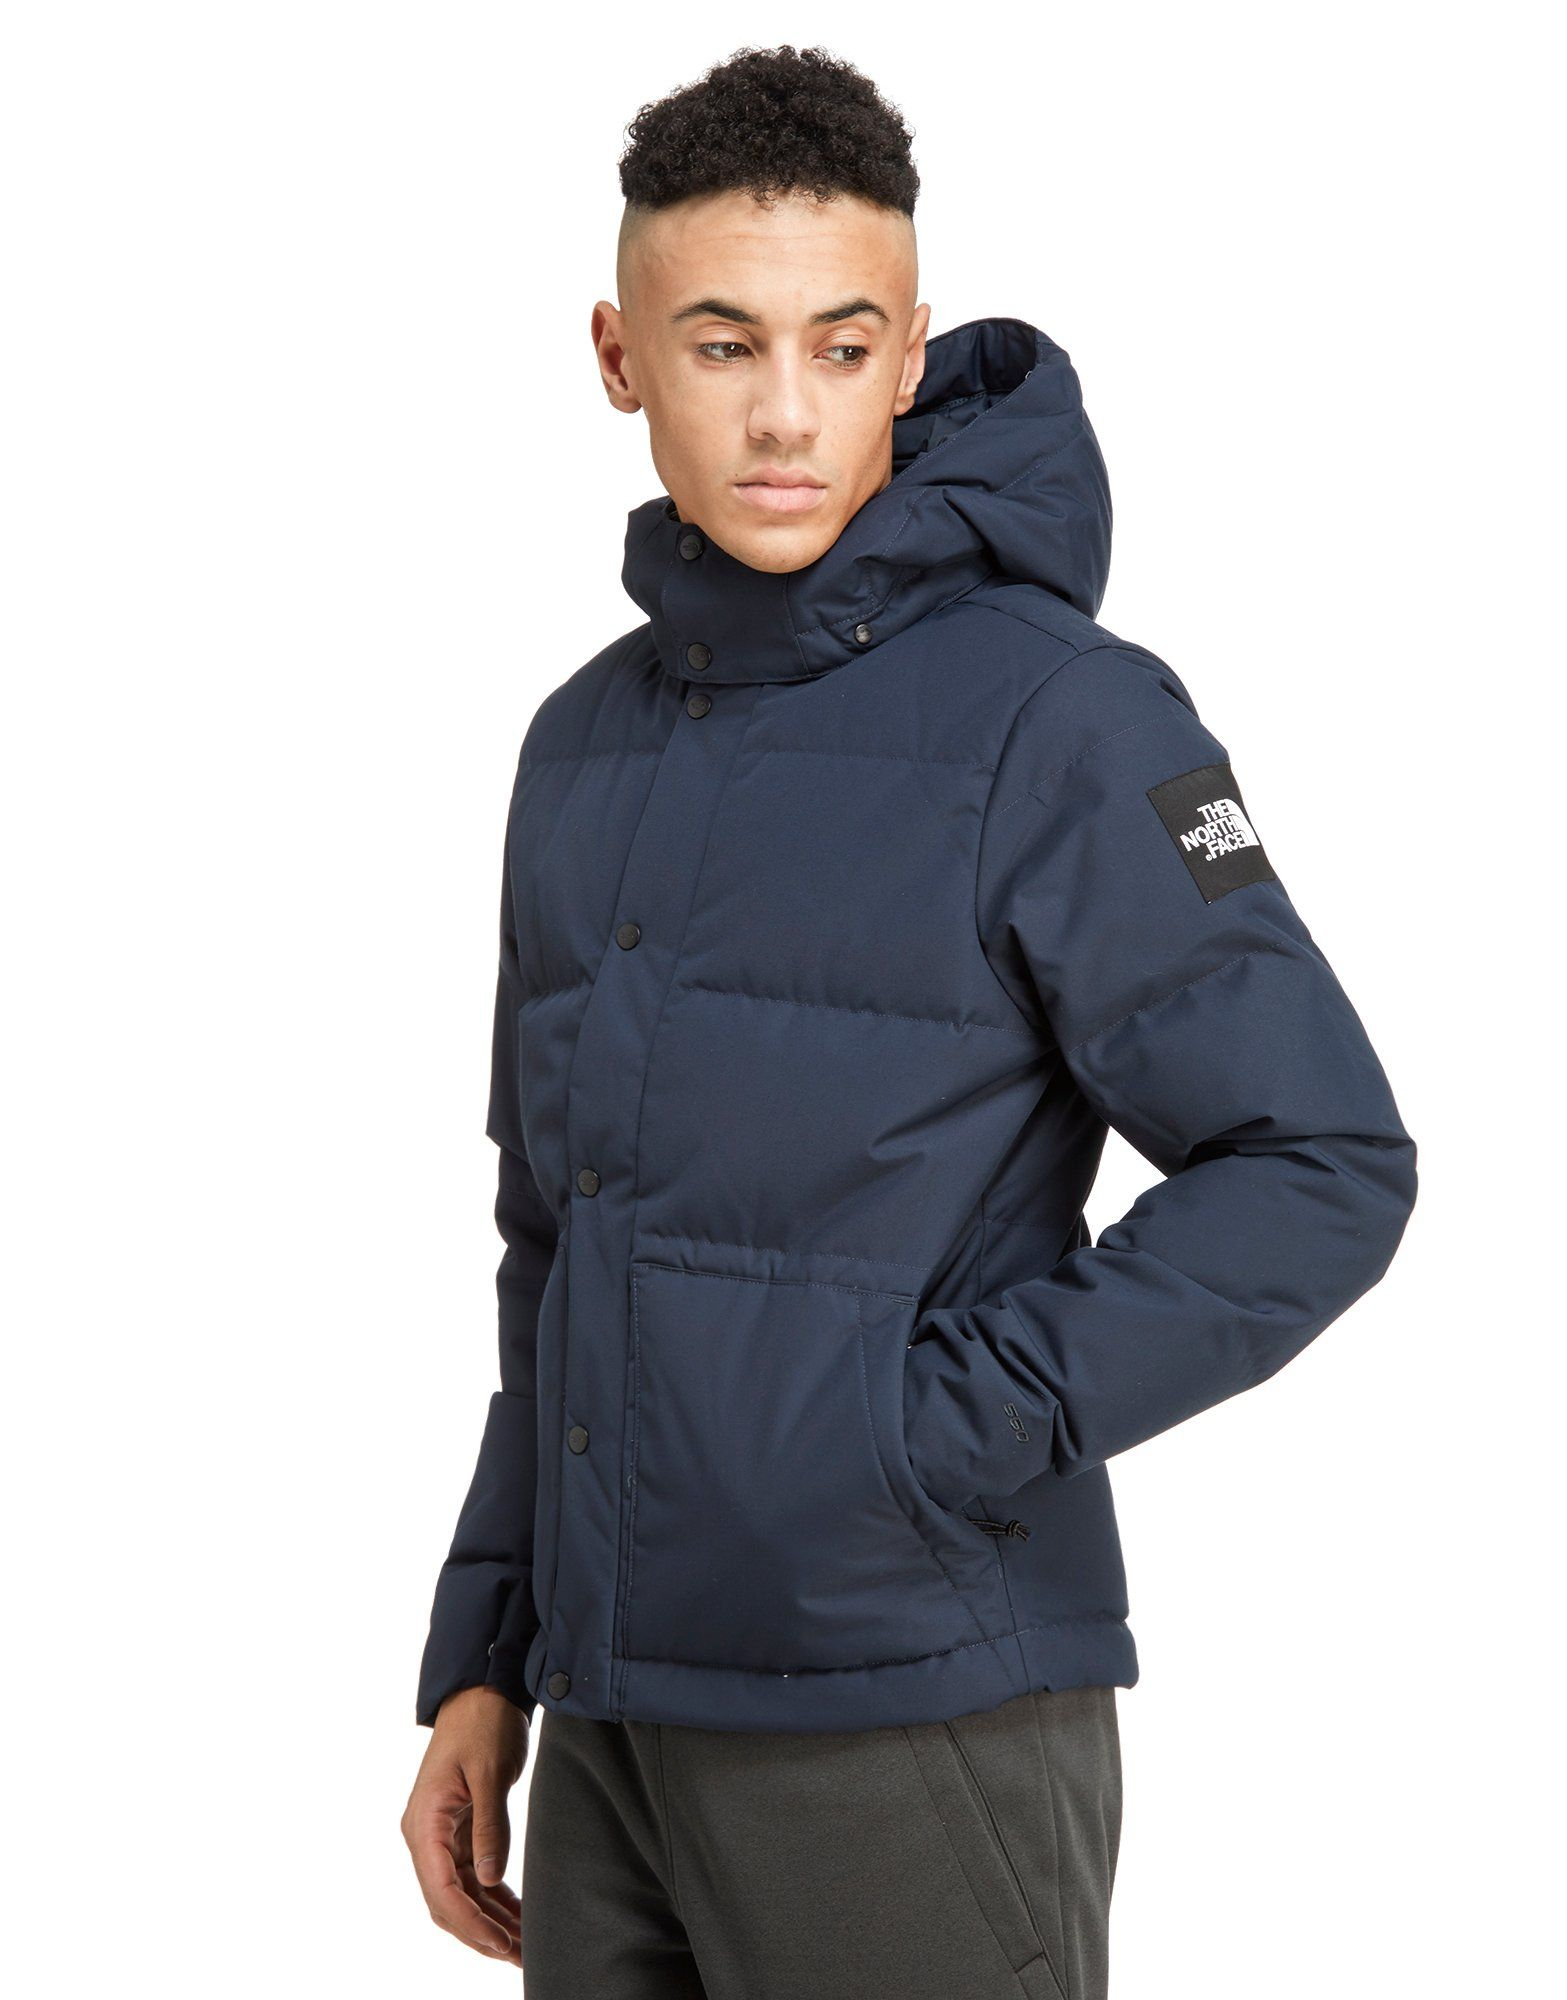 The North Face Box Canyon Black Label Jacket | JD Sports